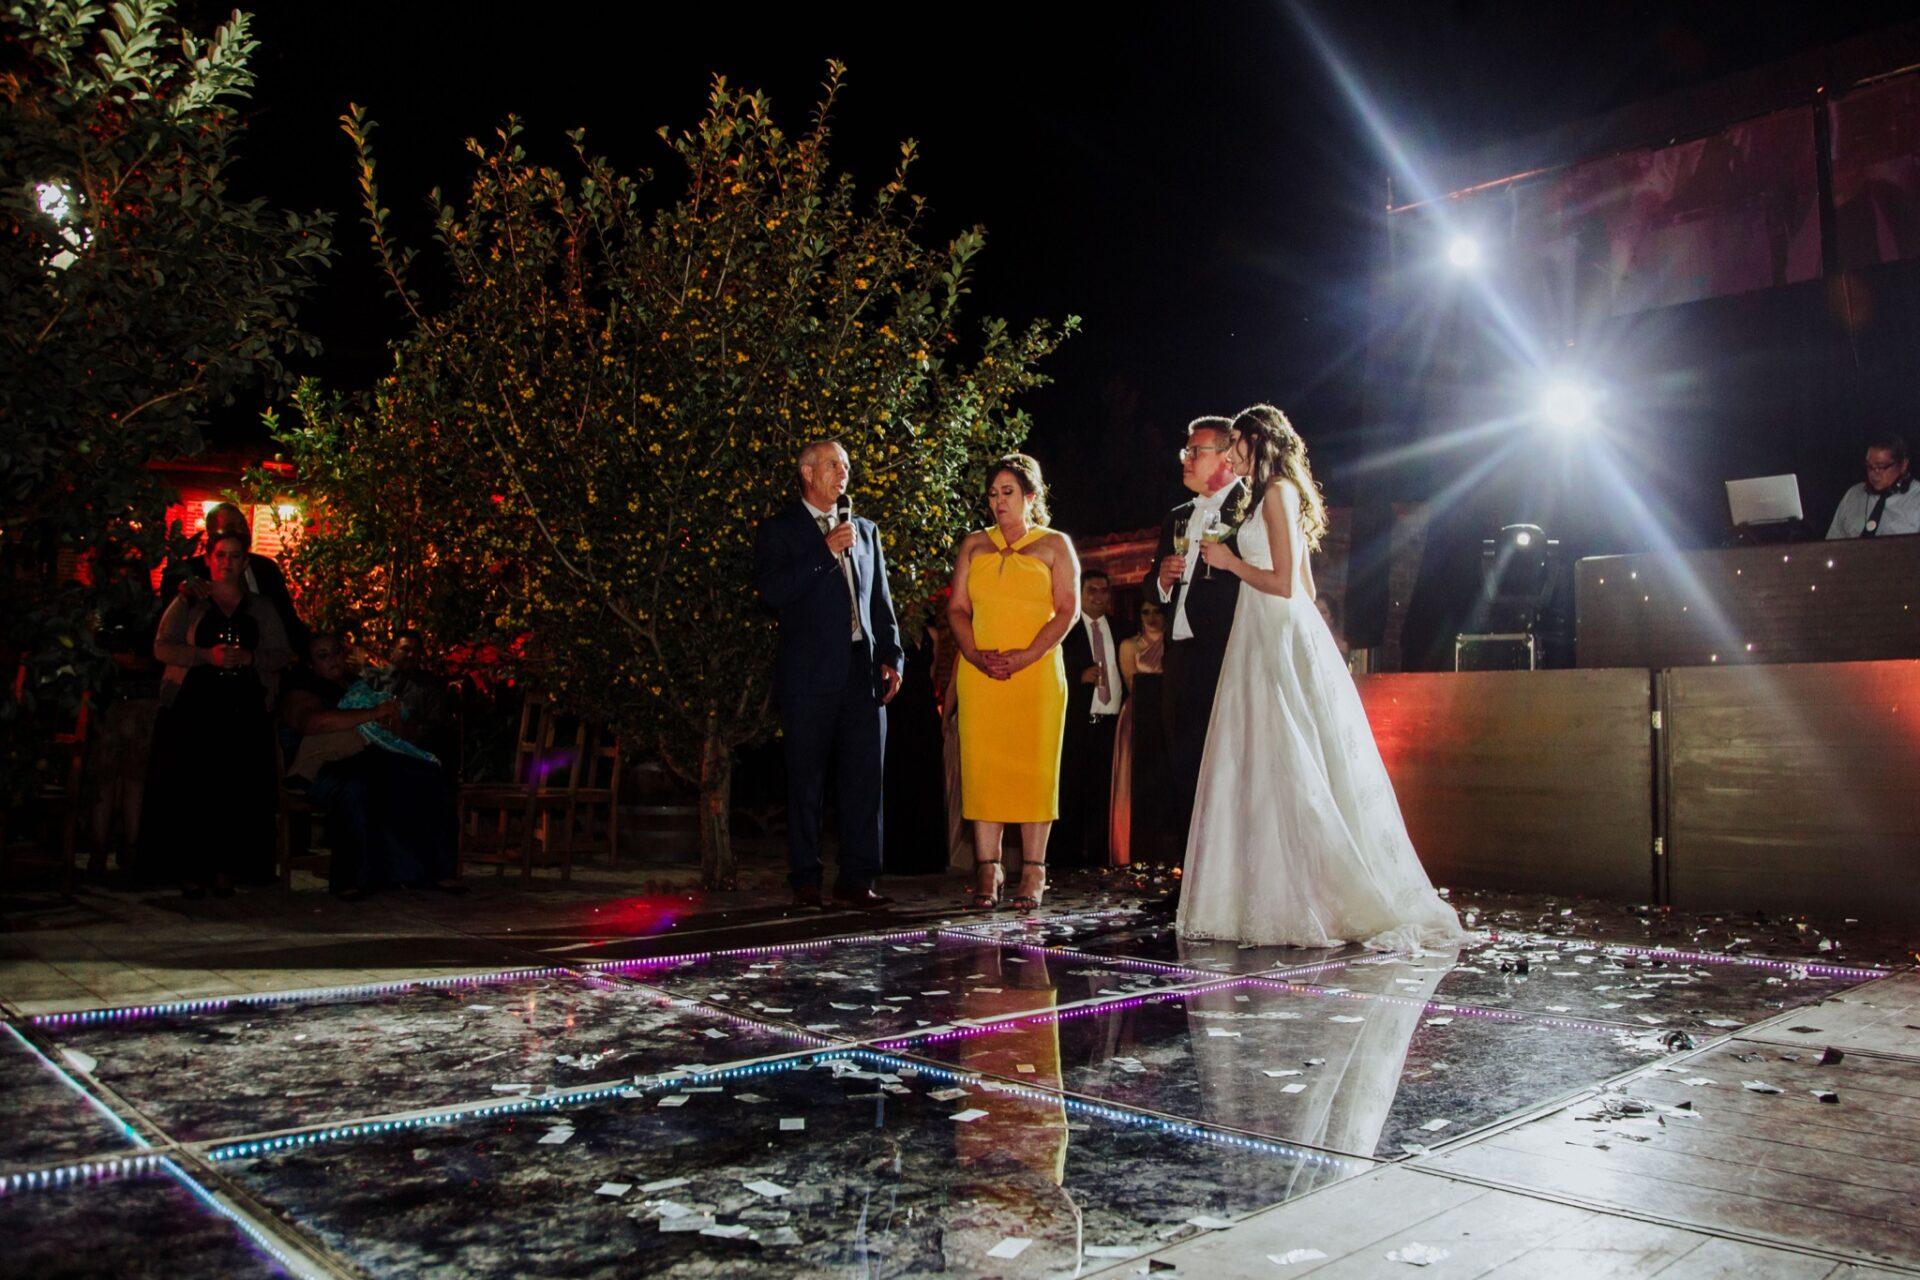 javier_noriega_fotografo_bodas_teul_zacatecas_wedding_photographer38